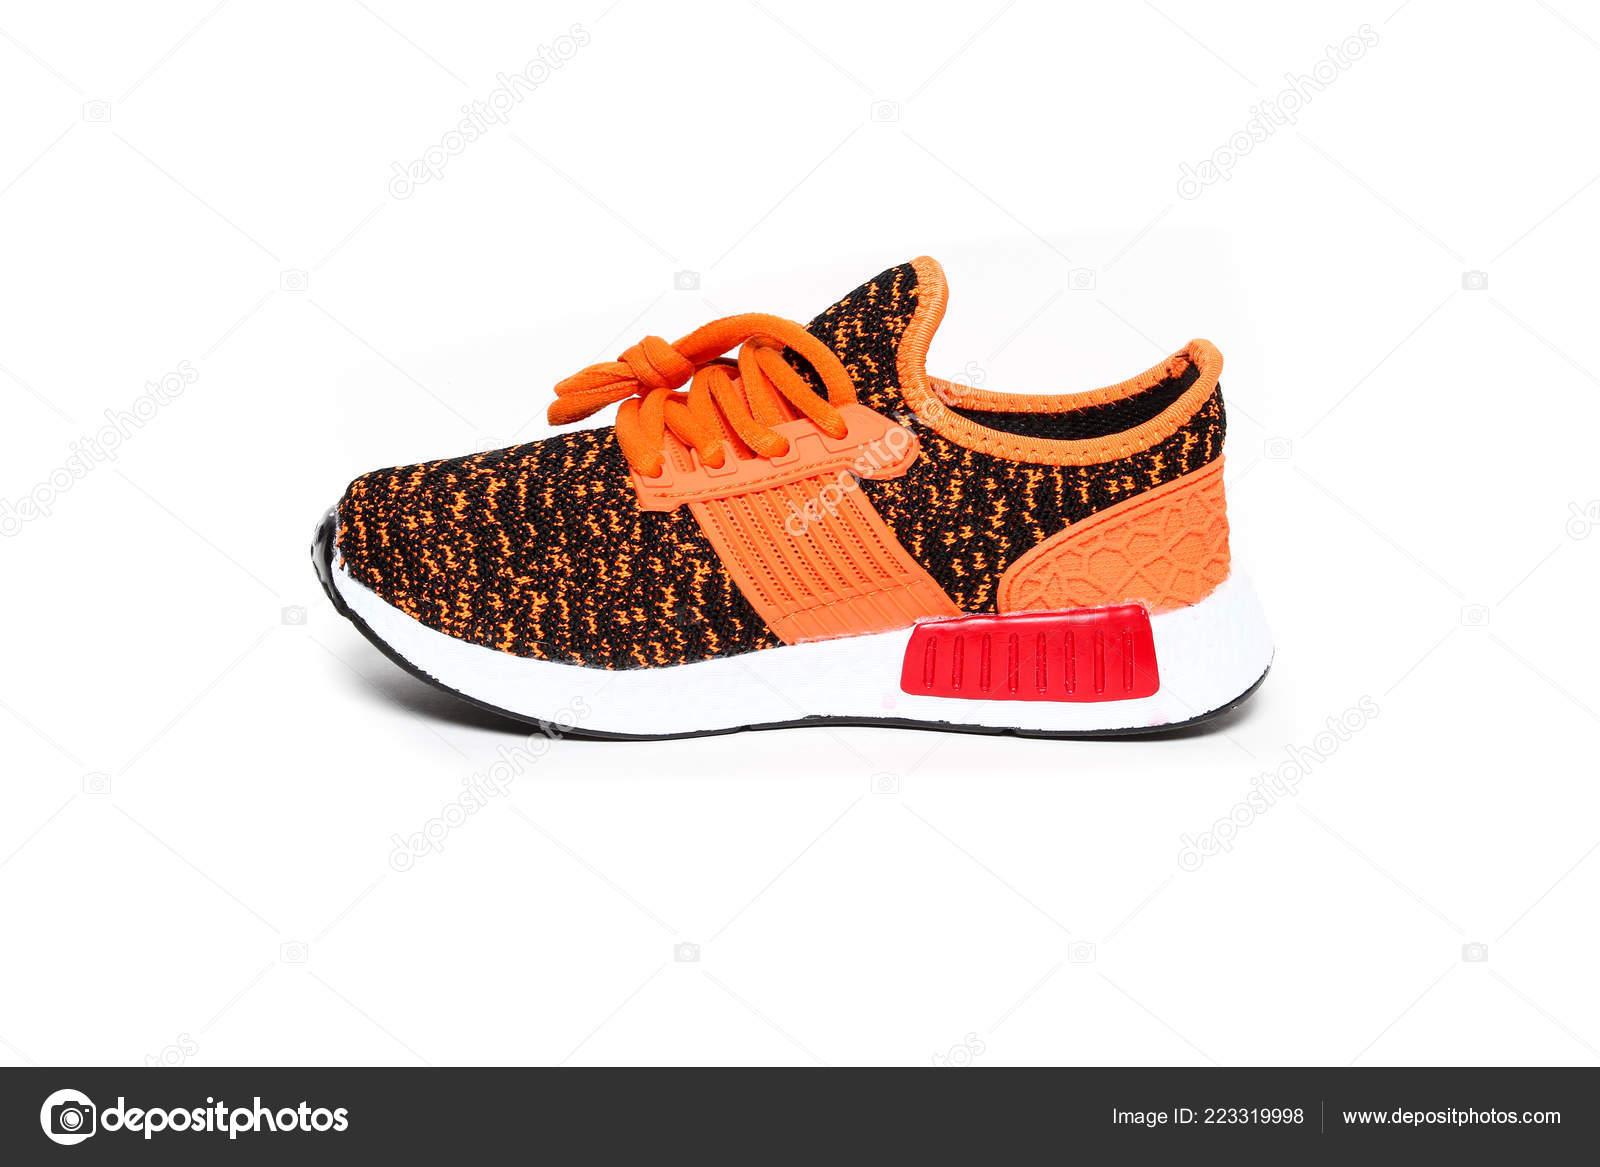 ad13a5ed005 Γυναικεία Αθλητικά Τρέχοντας Αθλητικά Παπούτσια Απομονώνονται Λευκό Φόντο  Πολύχρωμο– εικόνα αρχείου